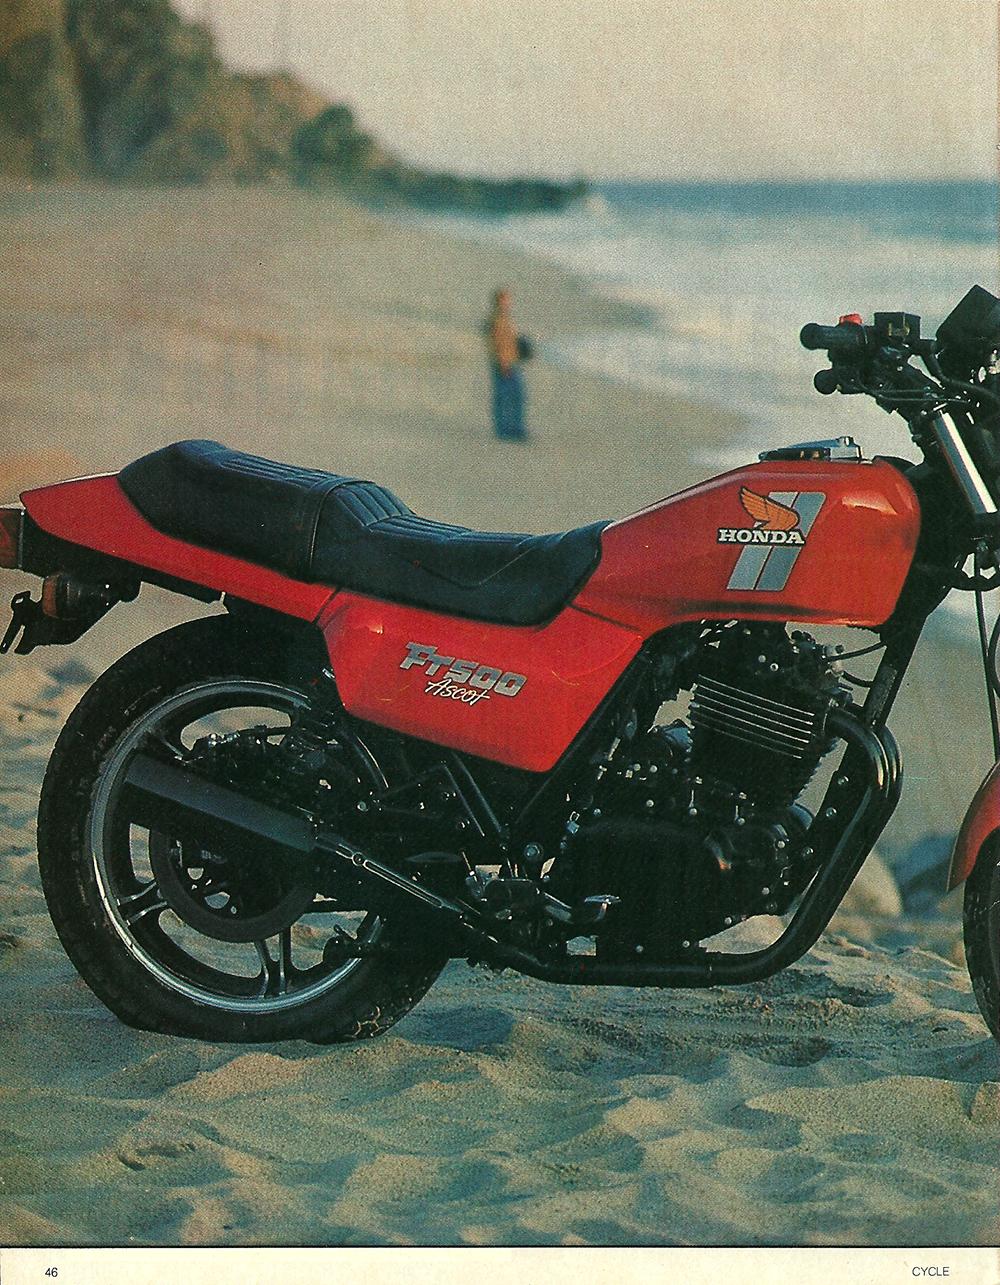 1982 Honda FT500 Ascot road test 2 01.jpg